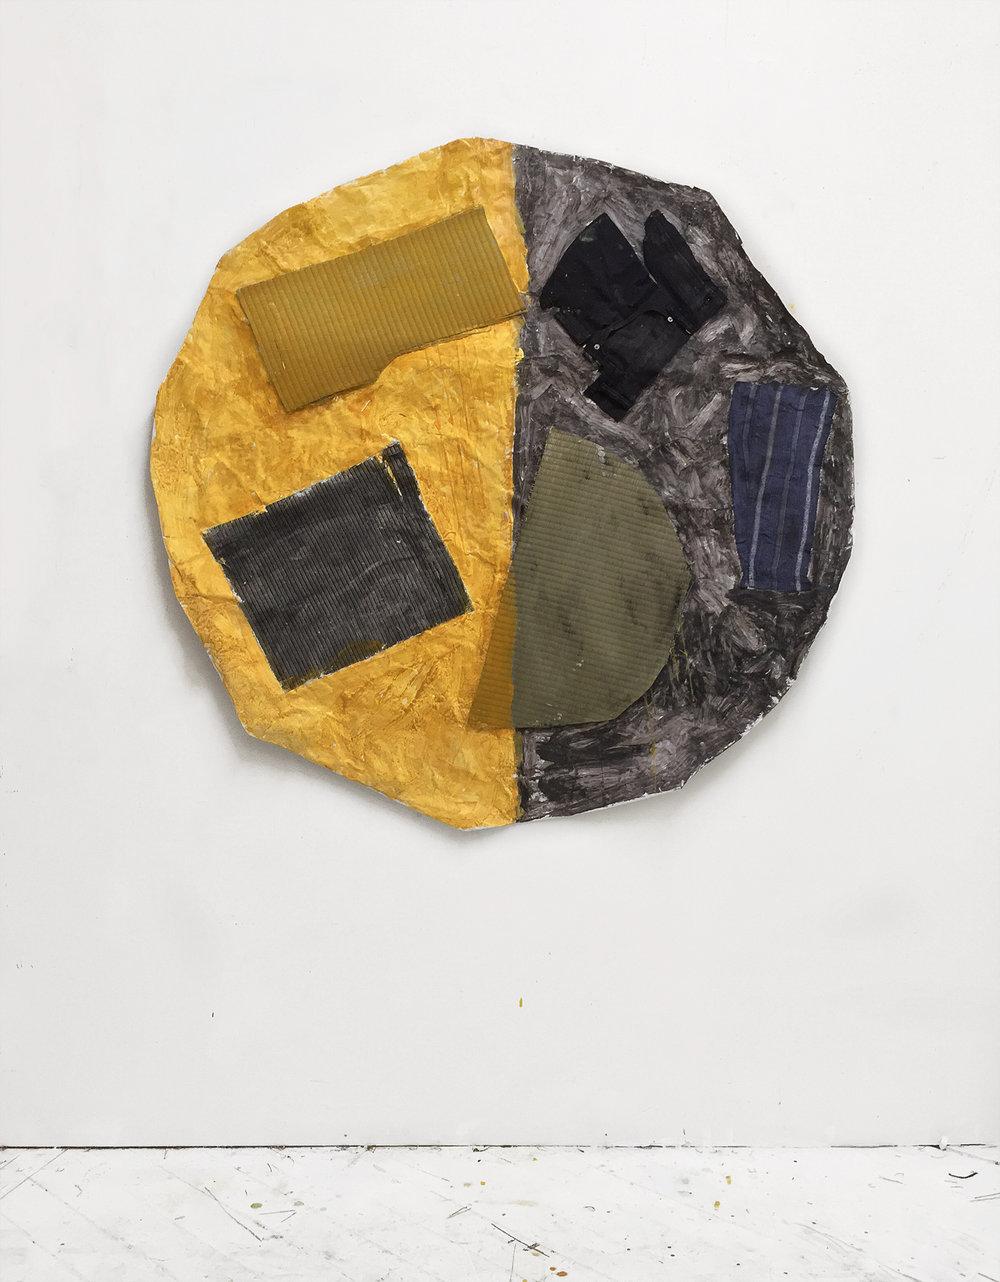 Moon , 2018 Acrylic, watercolor, latex, tatami mat, pants, yukata, paper, umbrella 48in x 48in